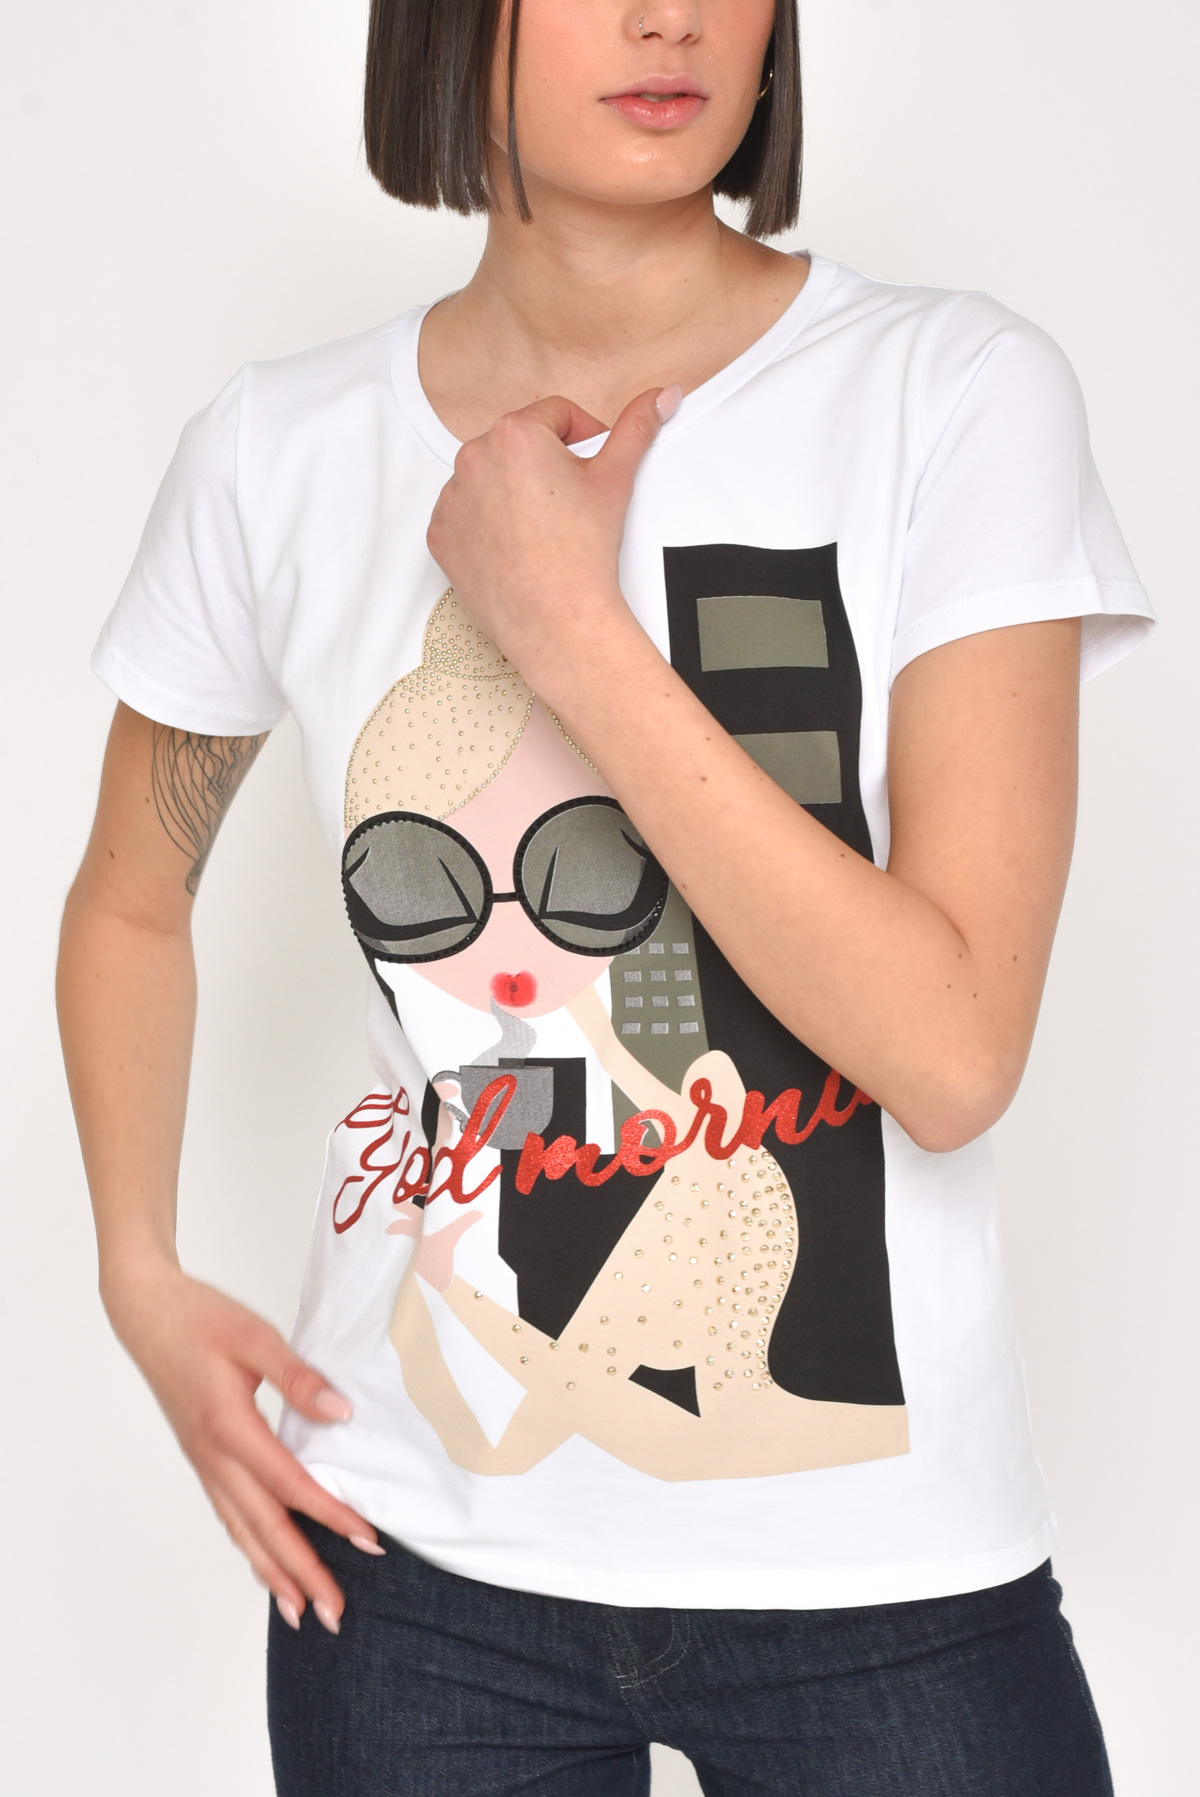 "T-SHIRT ""GOODMORNING"" IN COTONE CON STRASS for women - WHITE/BLACK - Paquito Pronto Moda Shop Online"